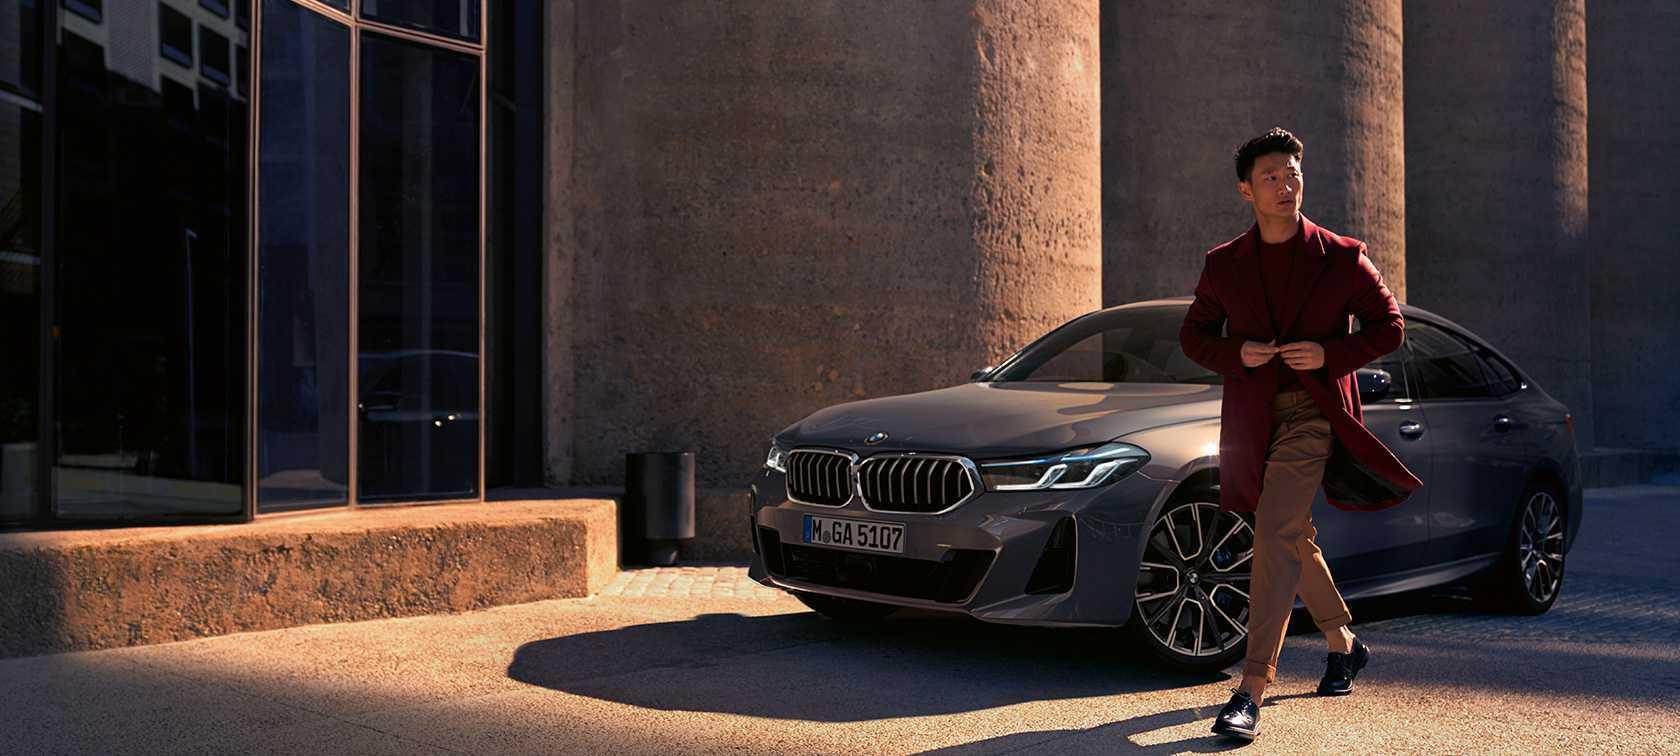 BMW 5 Gran Turismo — характеристики автомобиля